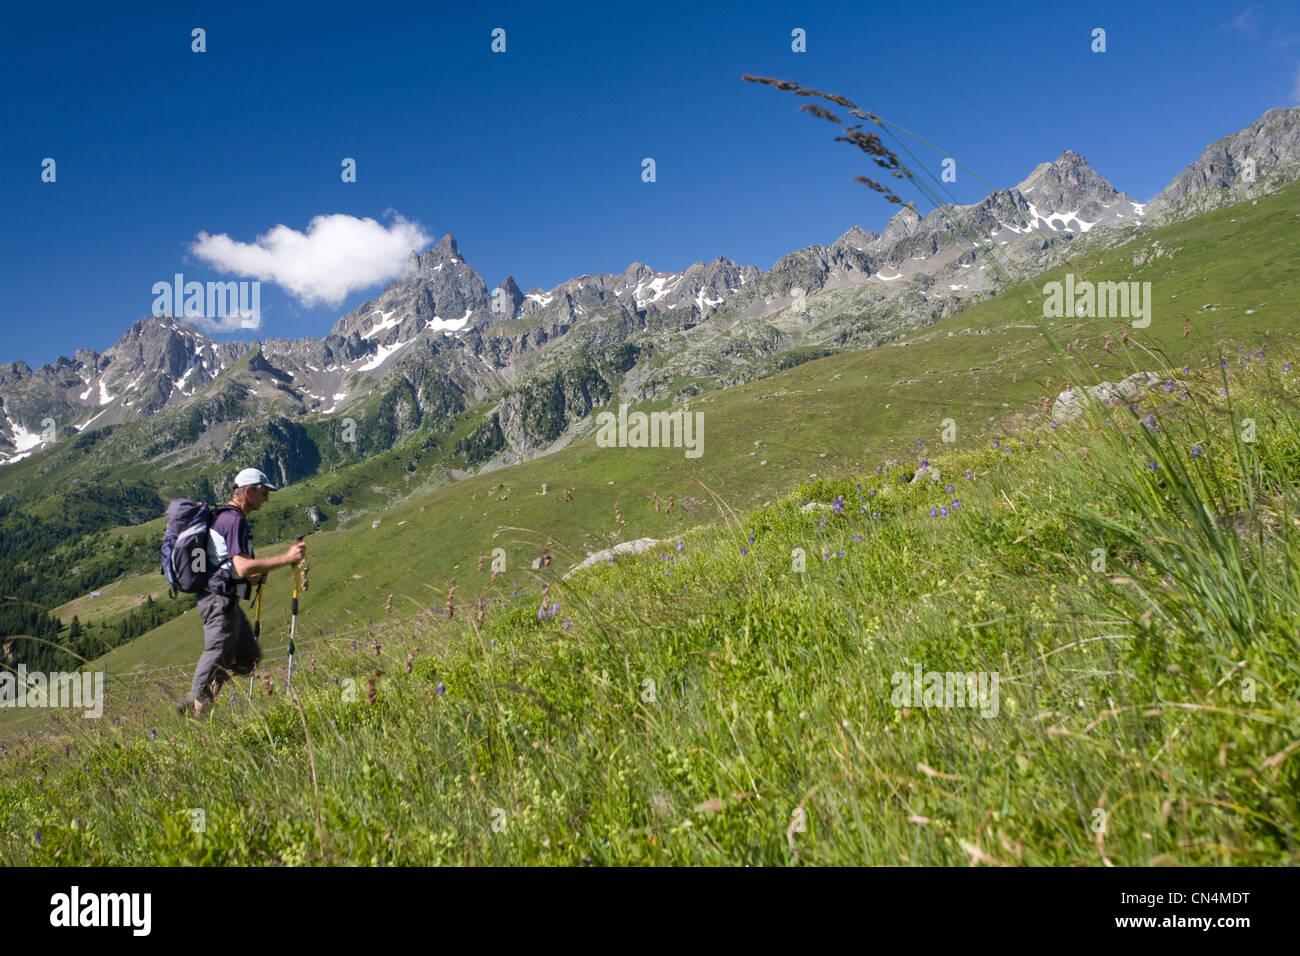 France, Isere, Oisans, Le Rivier d'Allemont, hiking to the Sciallet peak (2312m) in massif de Belledonne Stock Photo